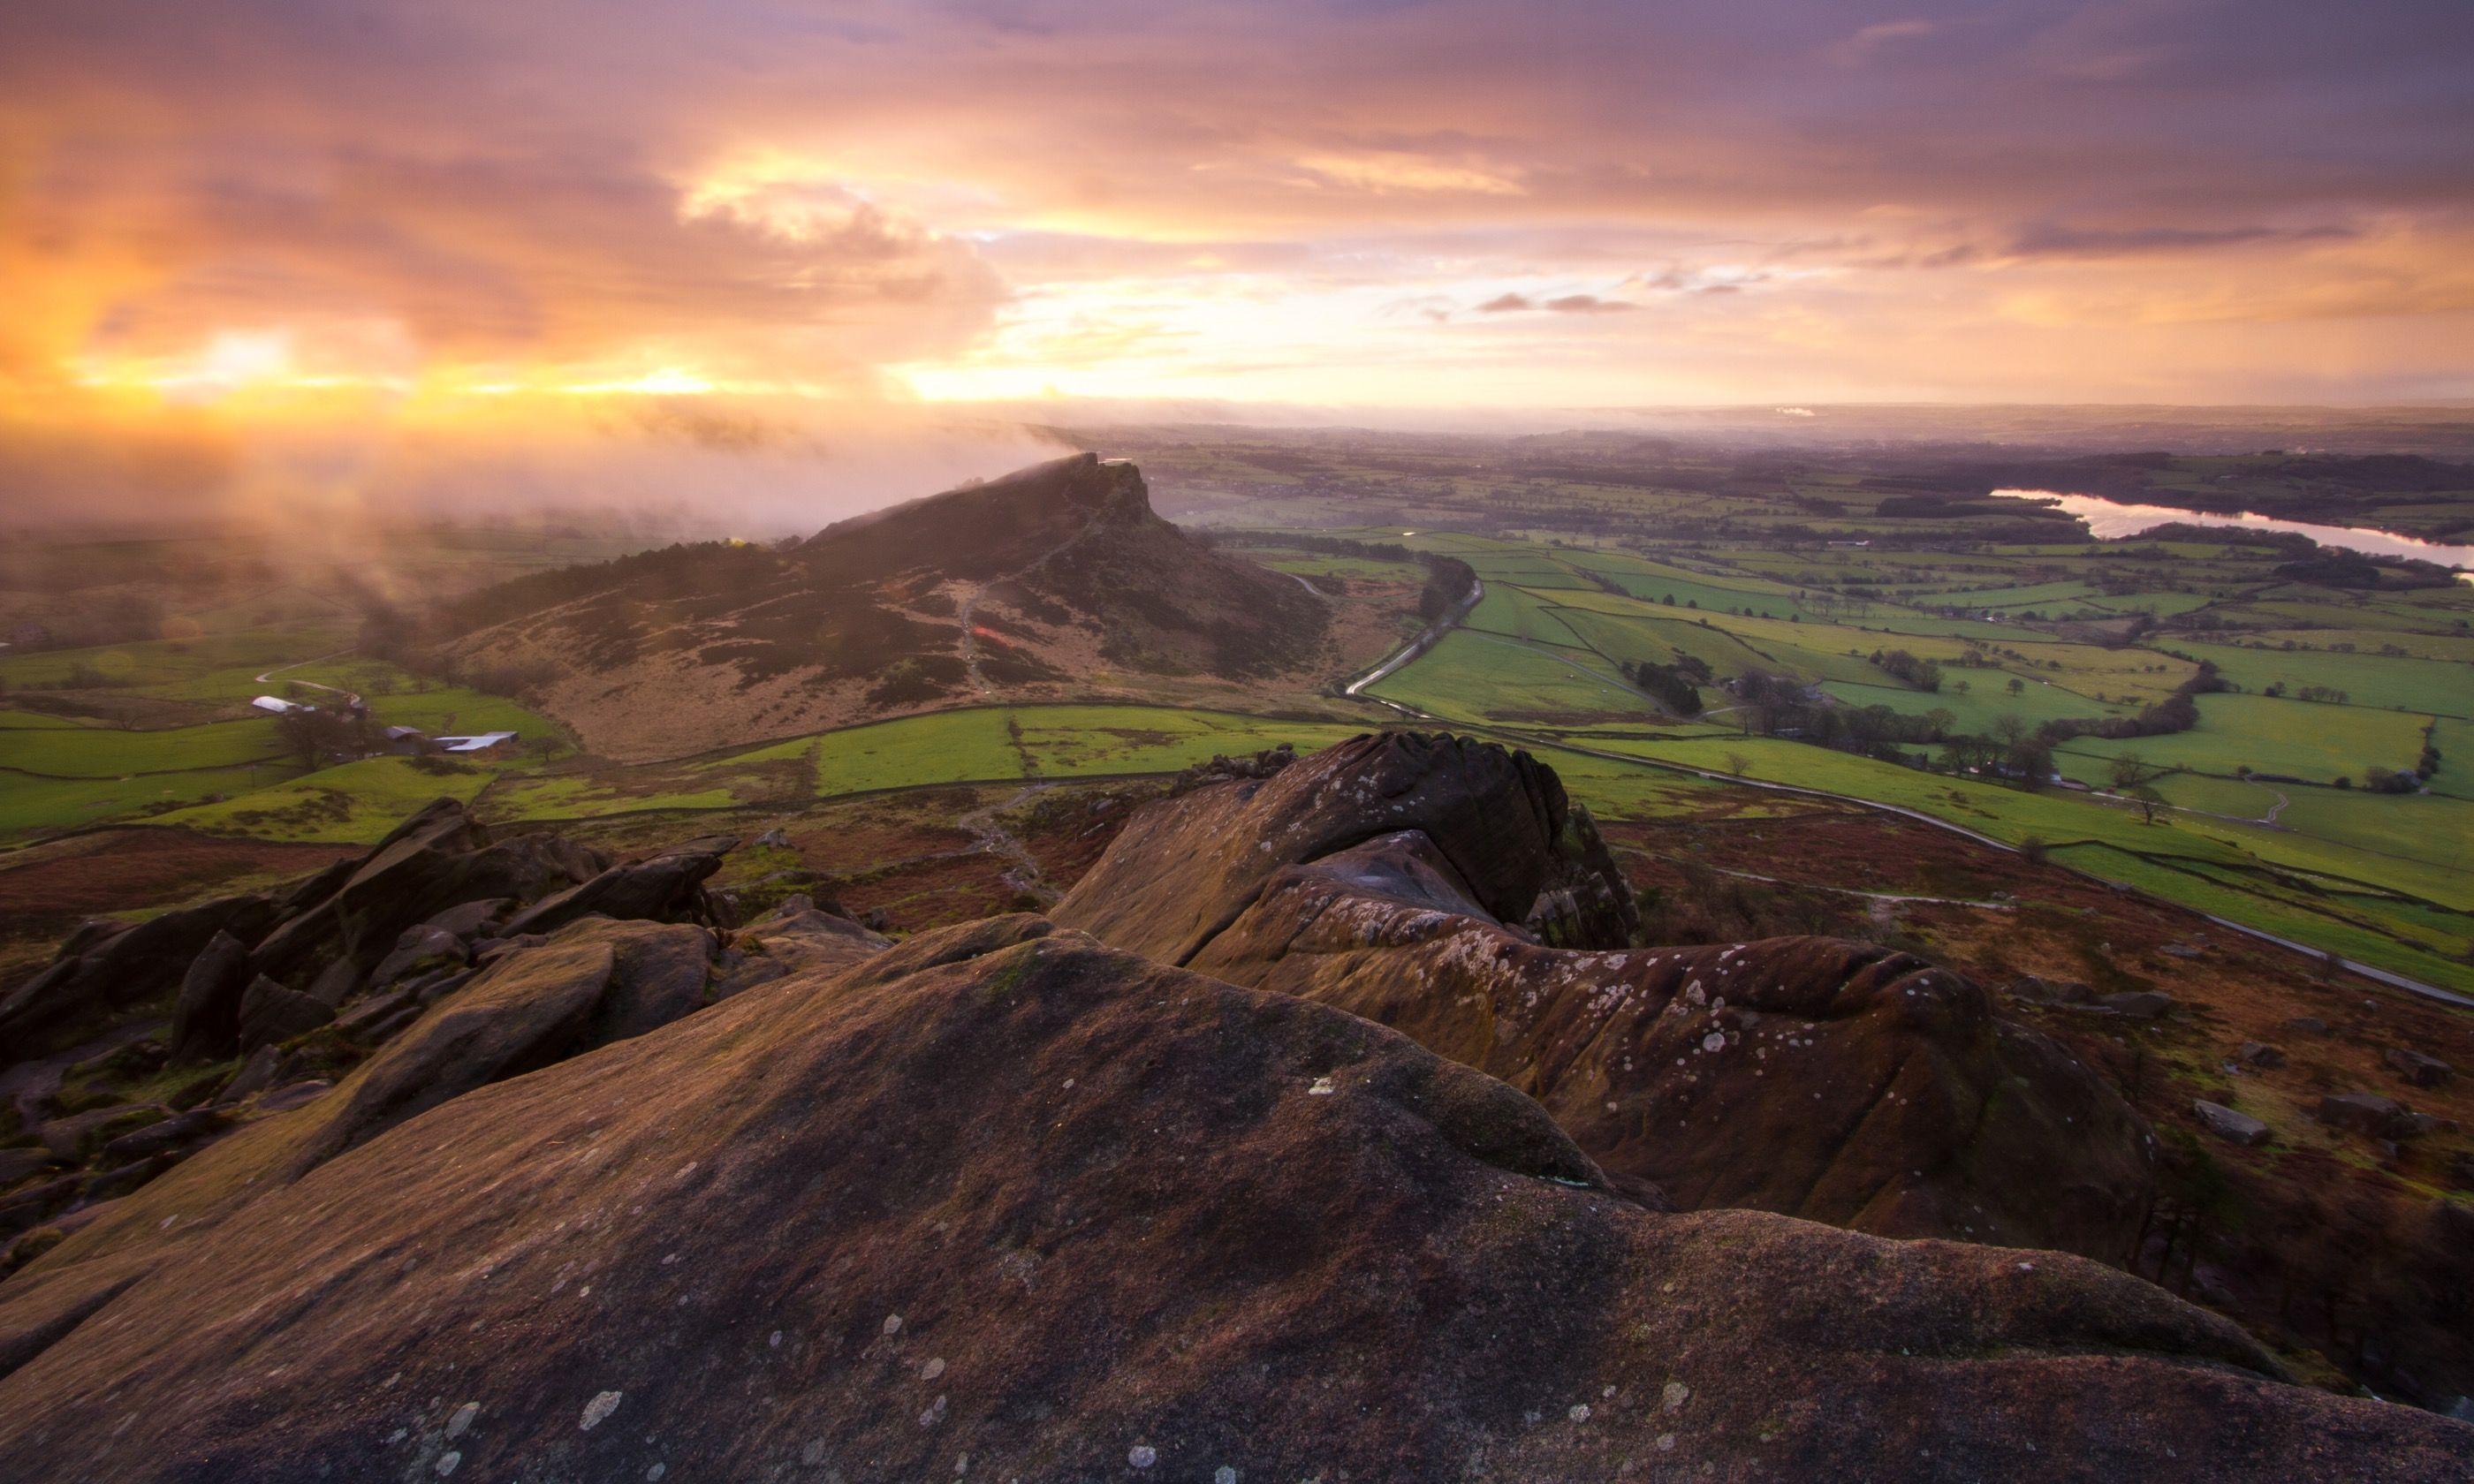 Sunrise over Hen Cloud in the Peak District (Shutterstock.com)